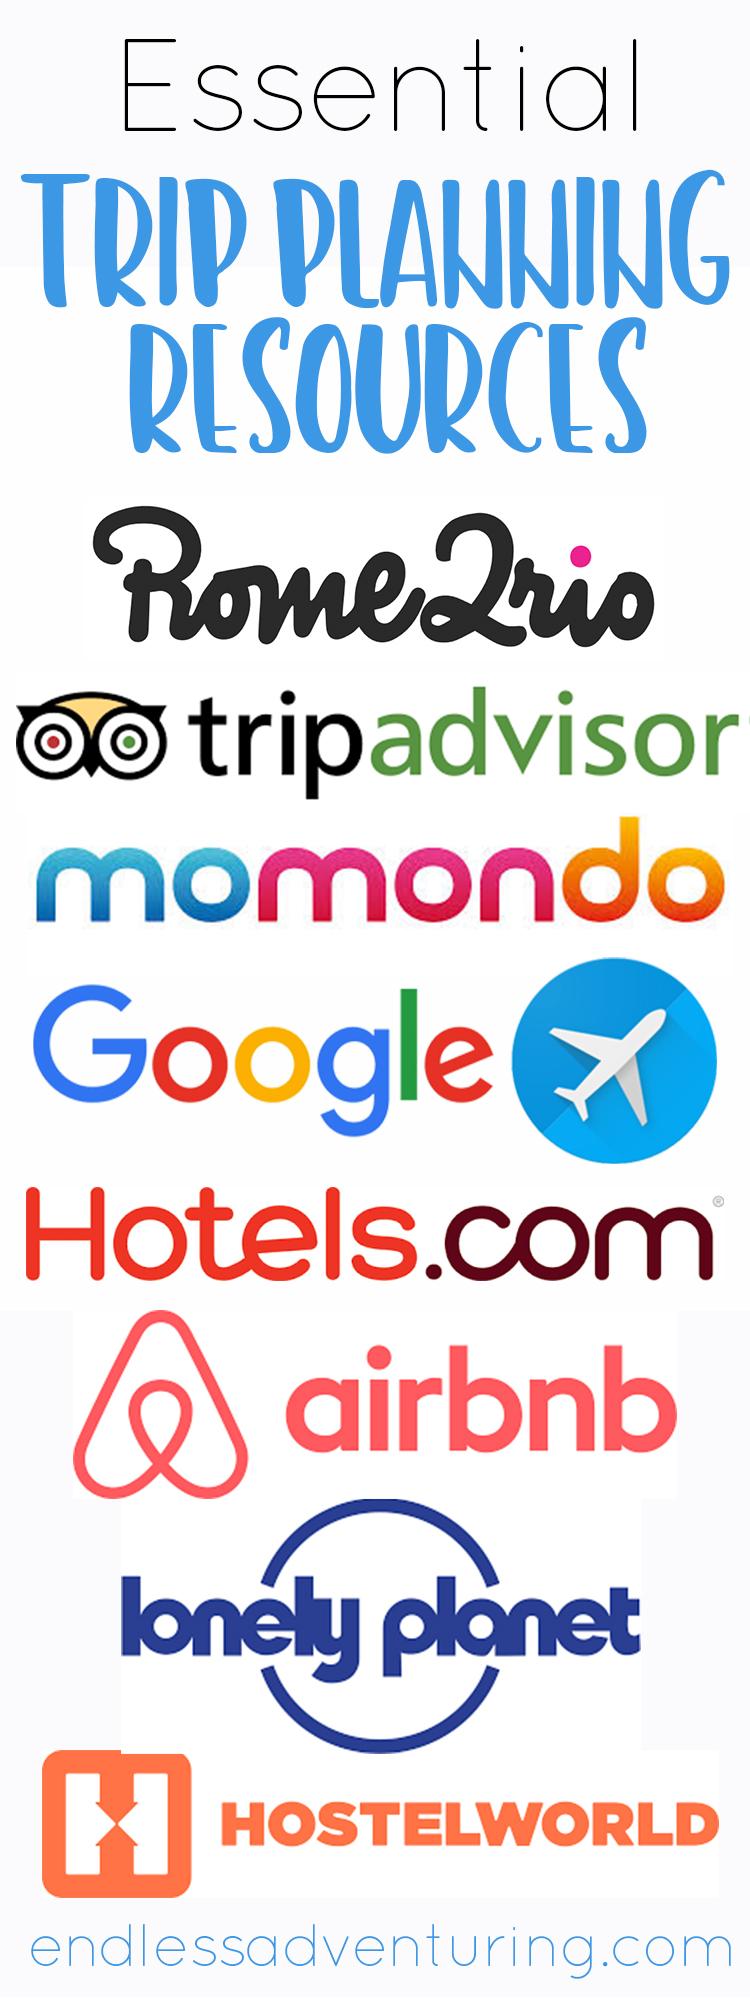 Essential Trip Planning Resources